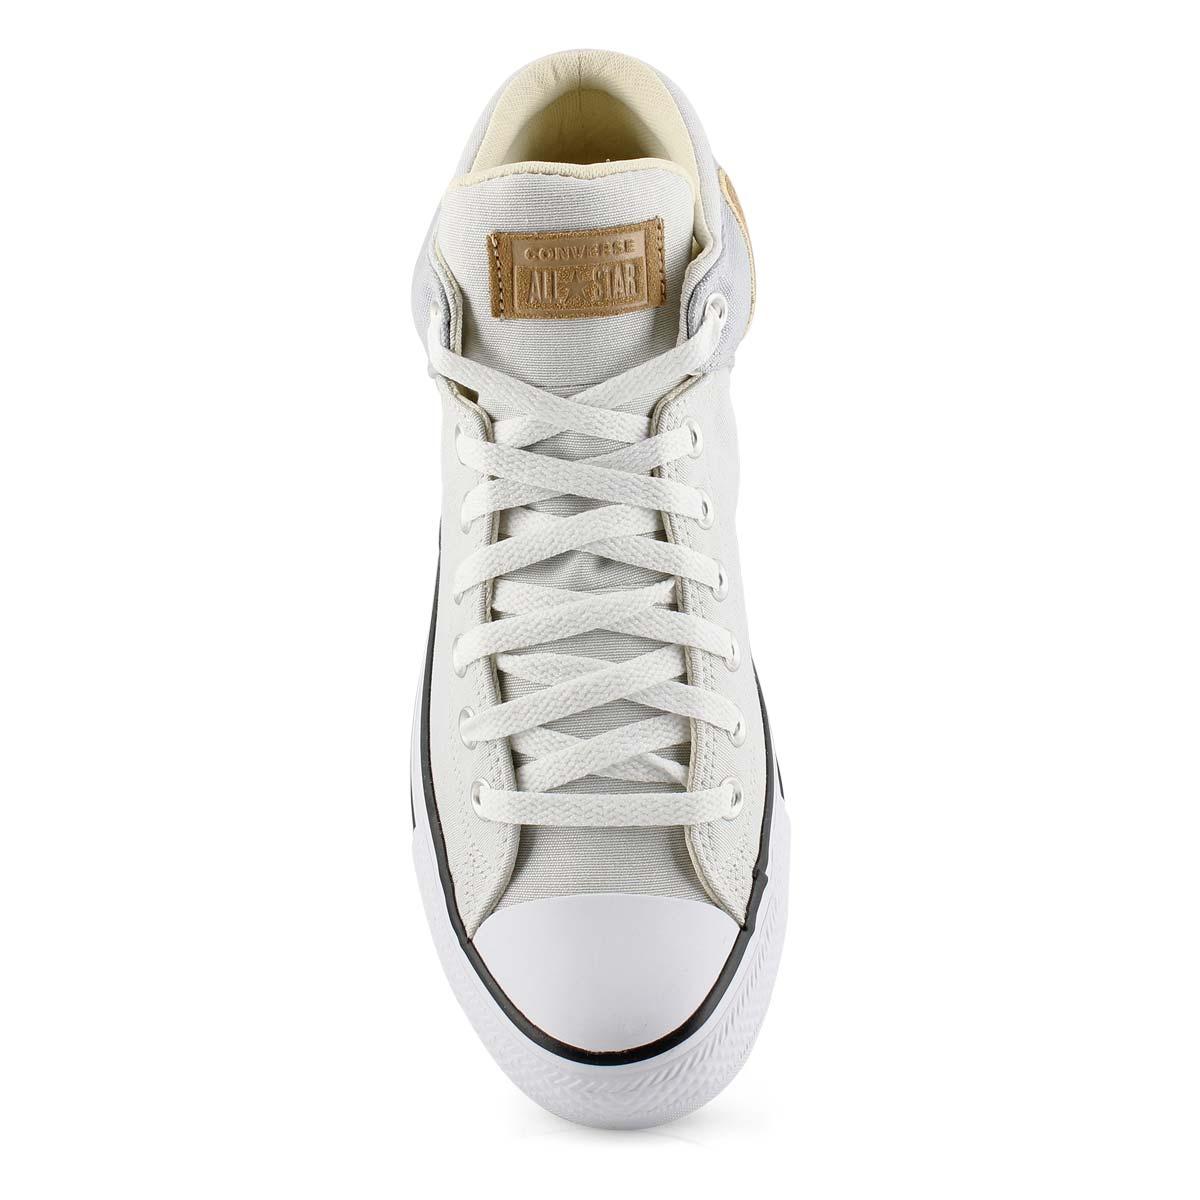 Men's All Star High Street Sneaker- Gry/Wht/Blk